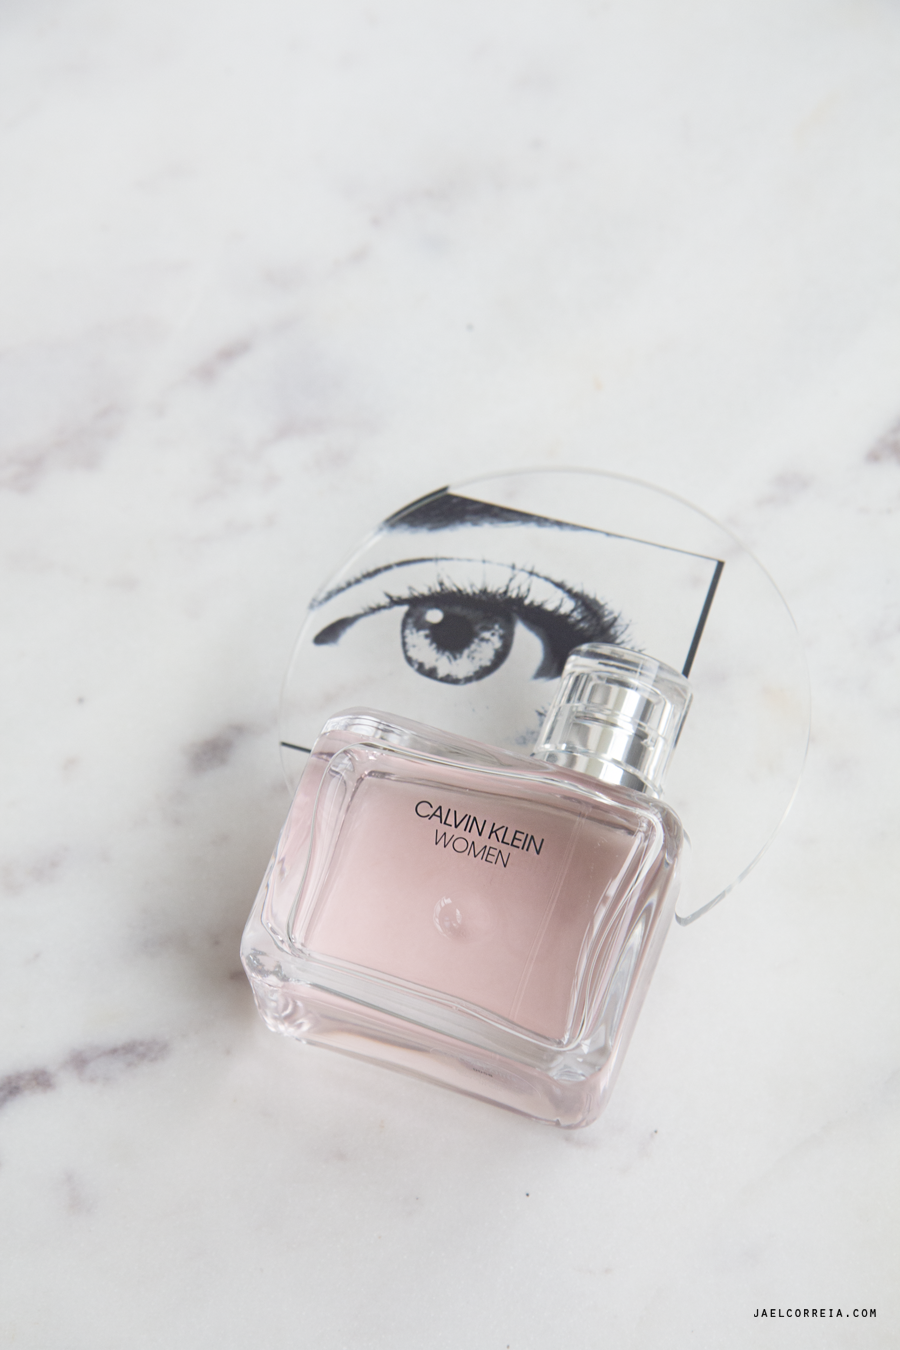 CK women Calvin Klein women eau de parfum perfume review jael correia portugal notino perfumes baratos originais femininos 01